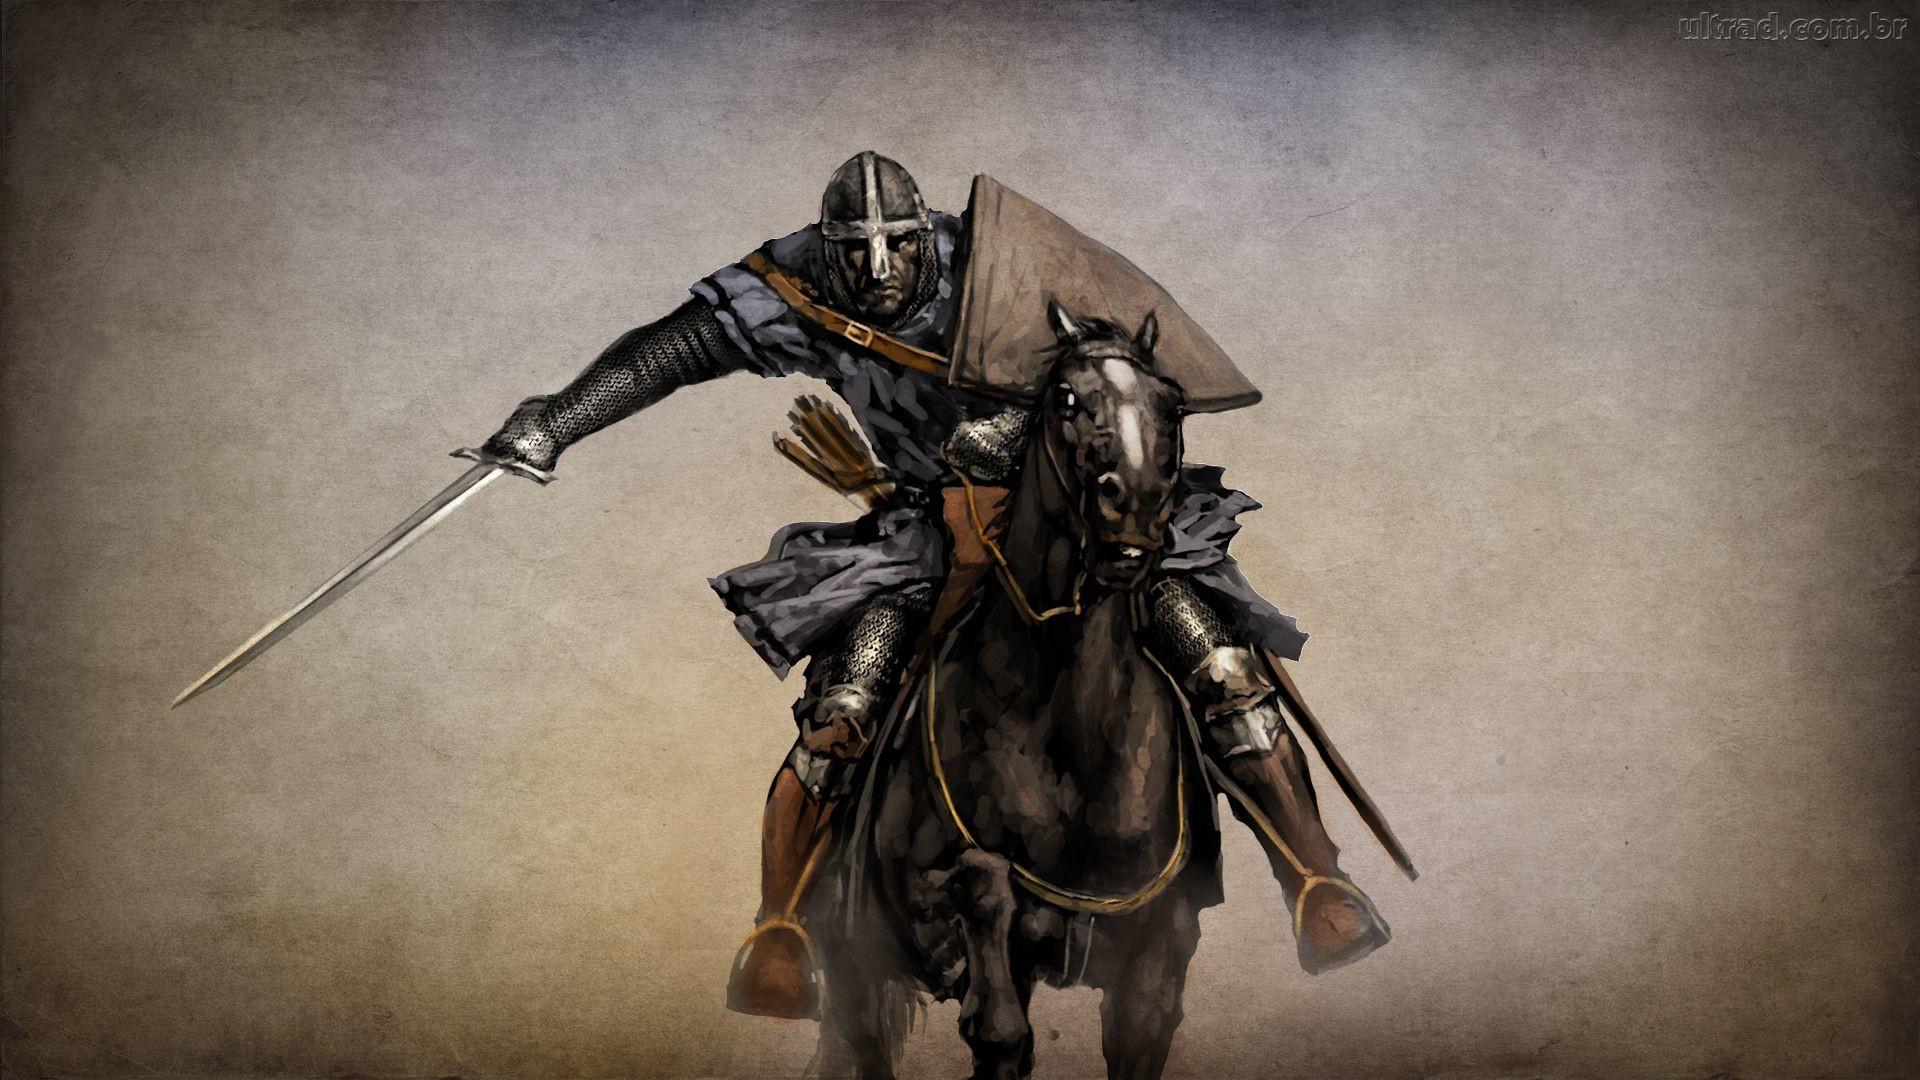 wallpaper cavaleiro medieval 3d – Pesquisa Google